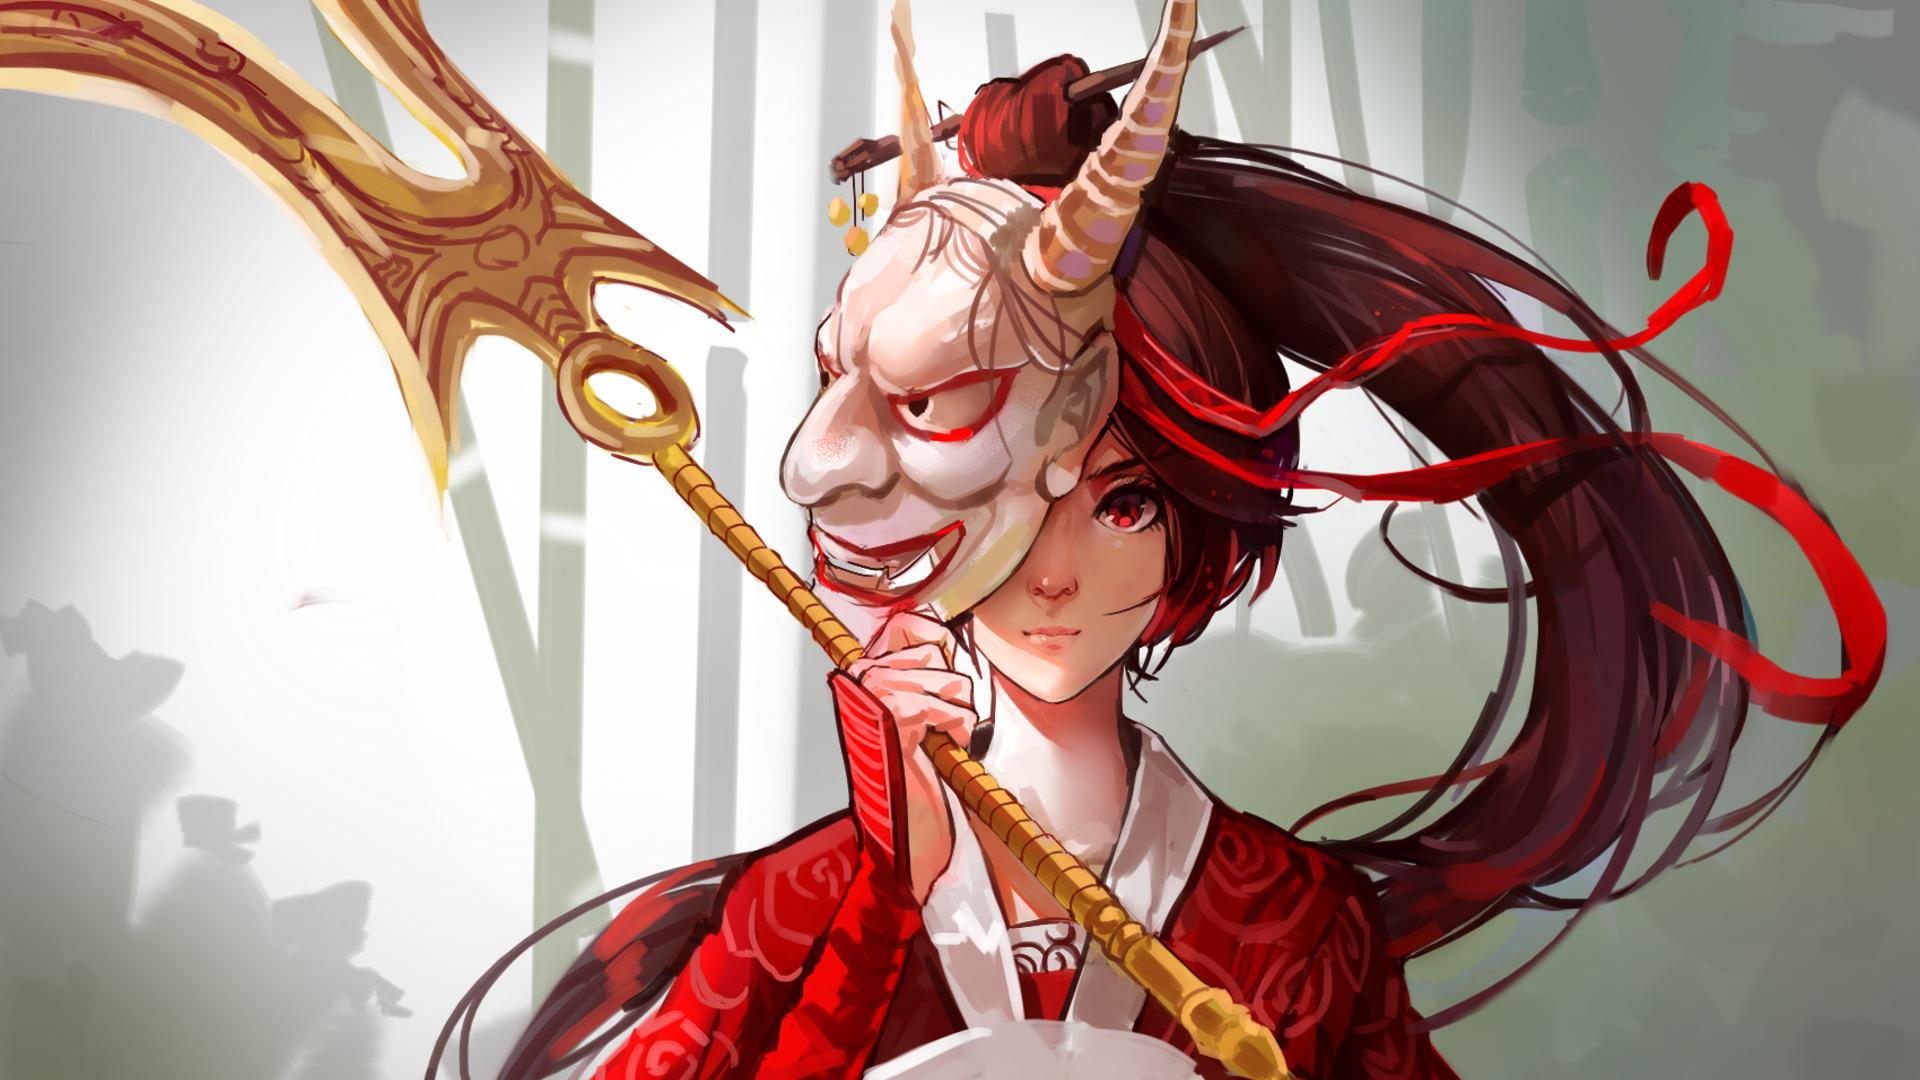 Uhd Wallpapers Girl Women Pc Gaming League Of Legends Akali Anime Girls